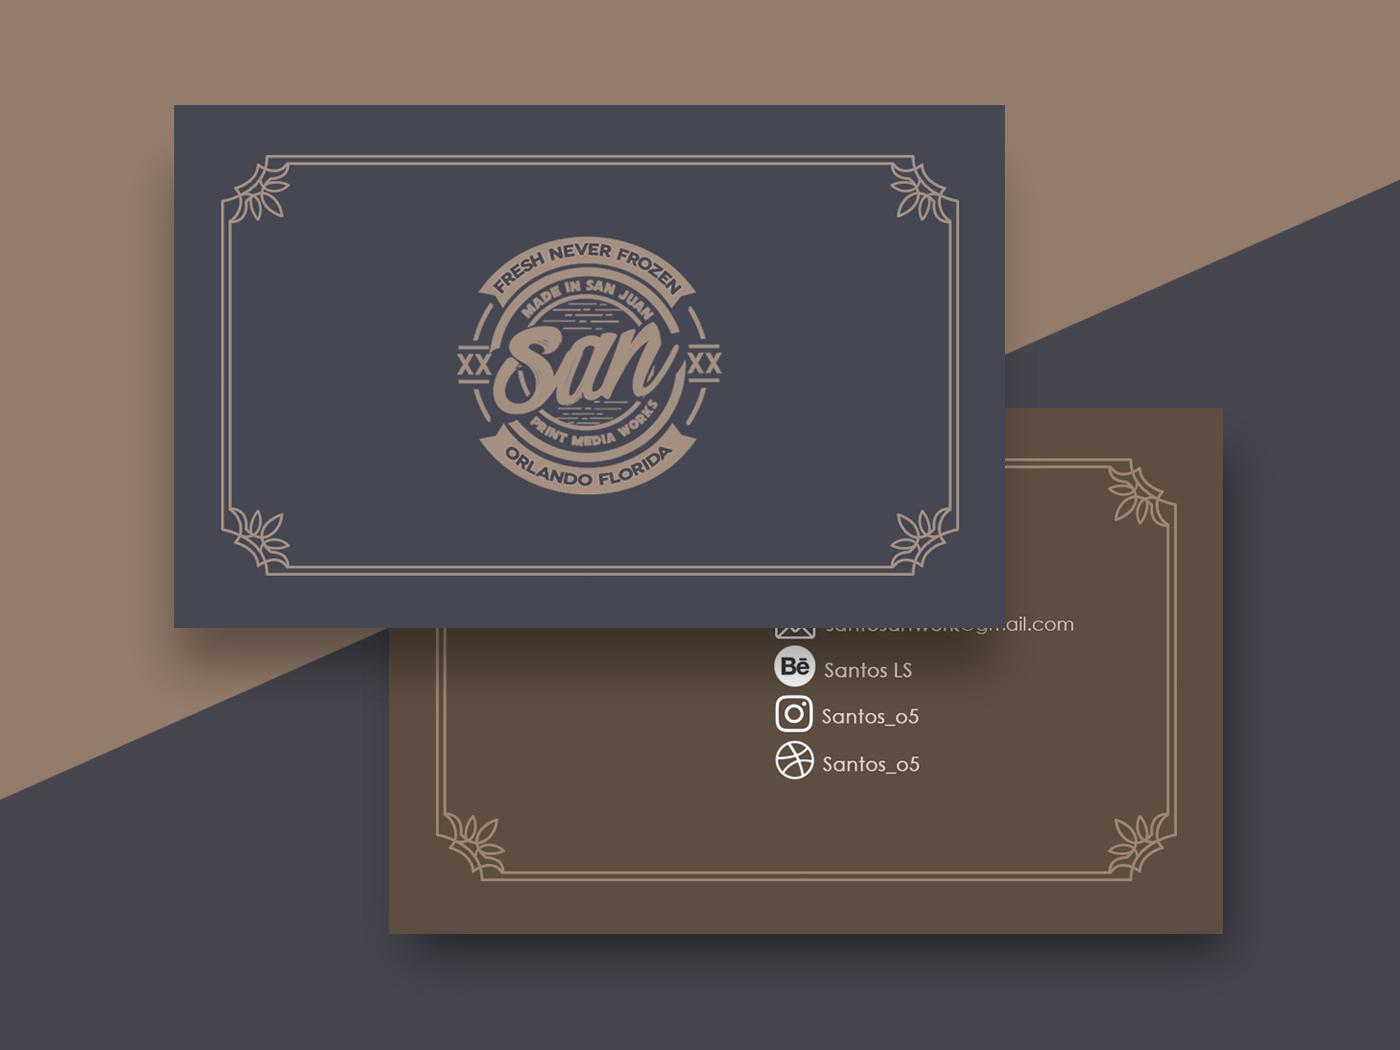 Santos Cards branding typography print design badge logo badge business card